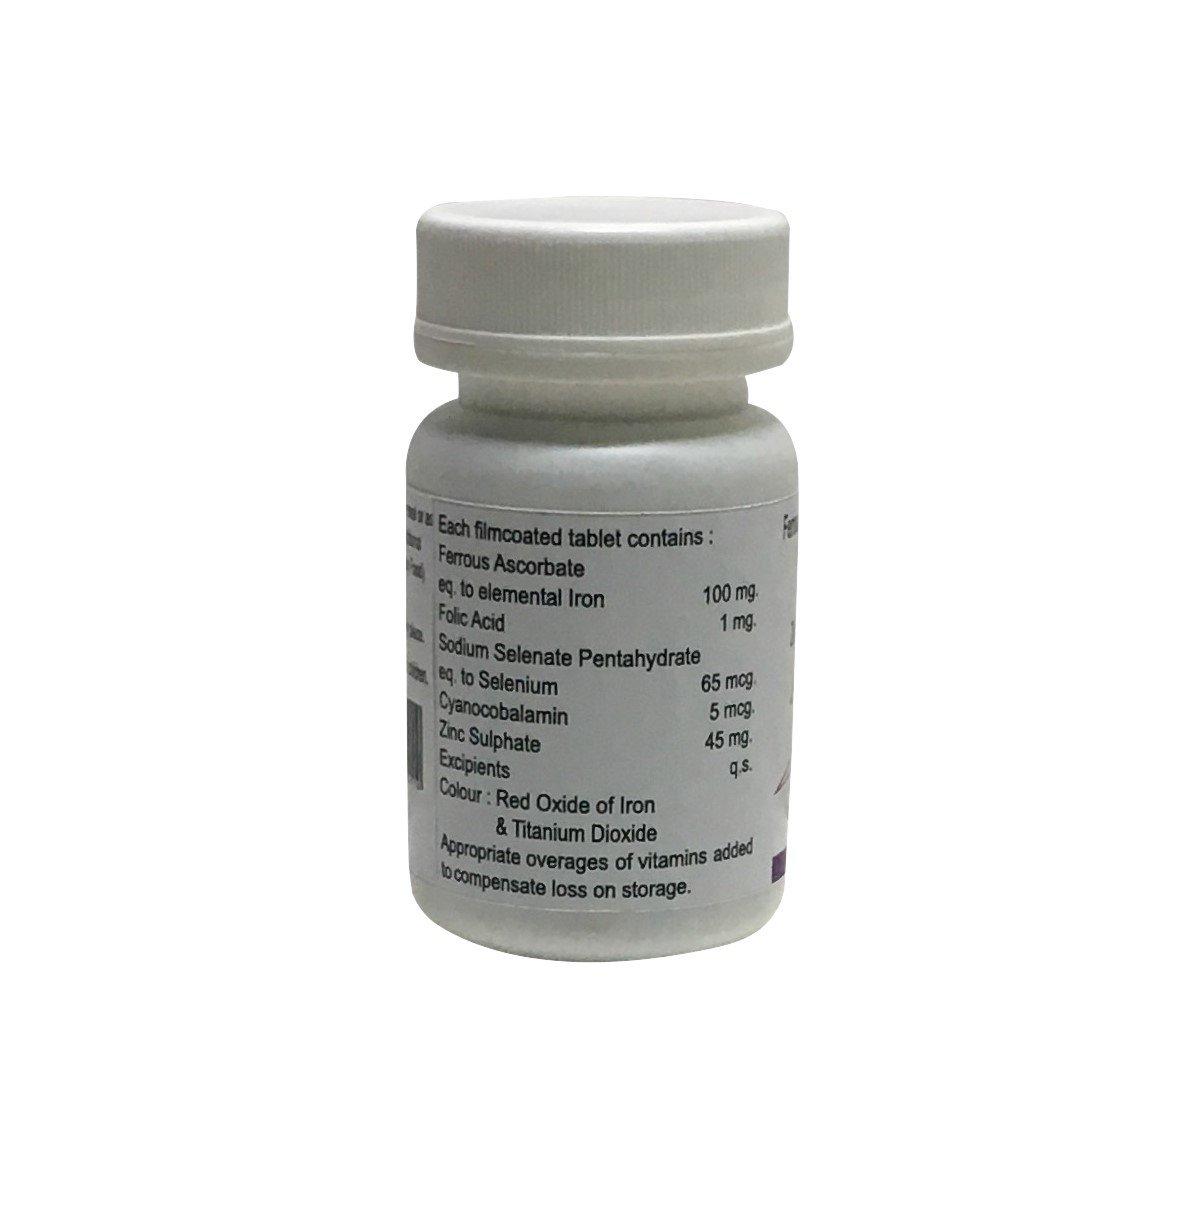 Buy Medipol Anego Ferrous Ascorbate Folic Acid Cyanocobalamin